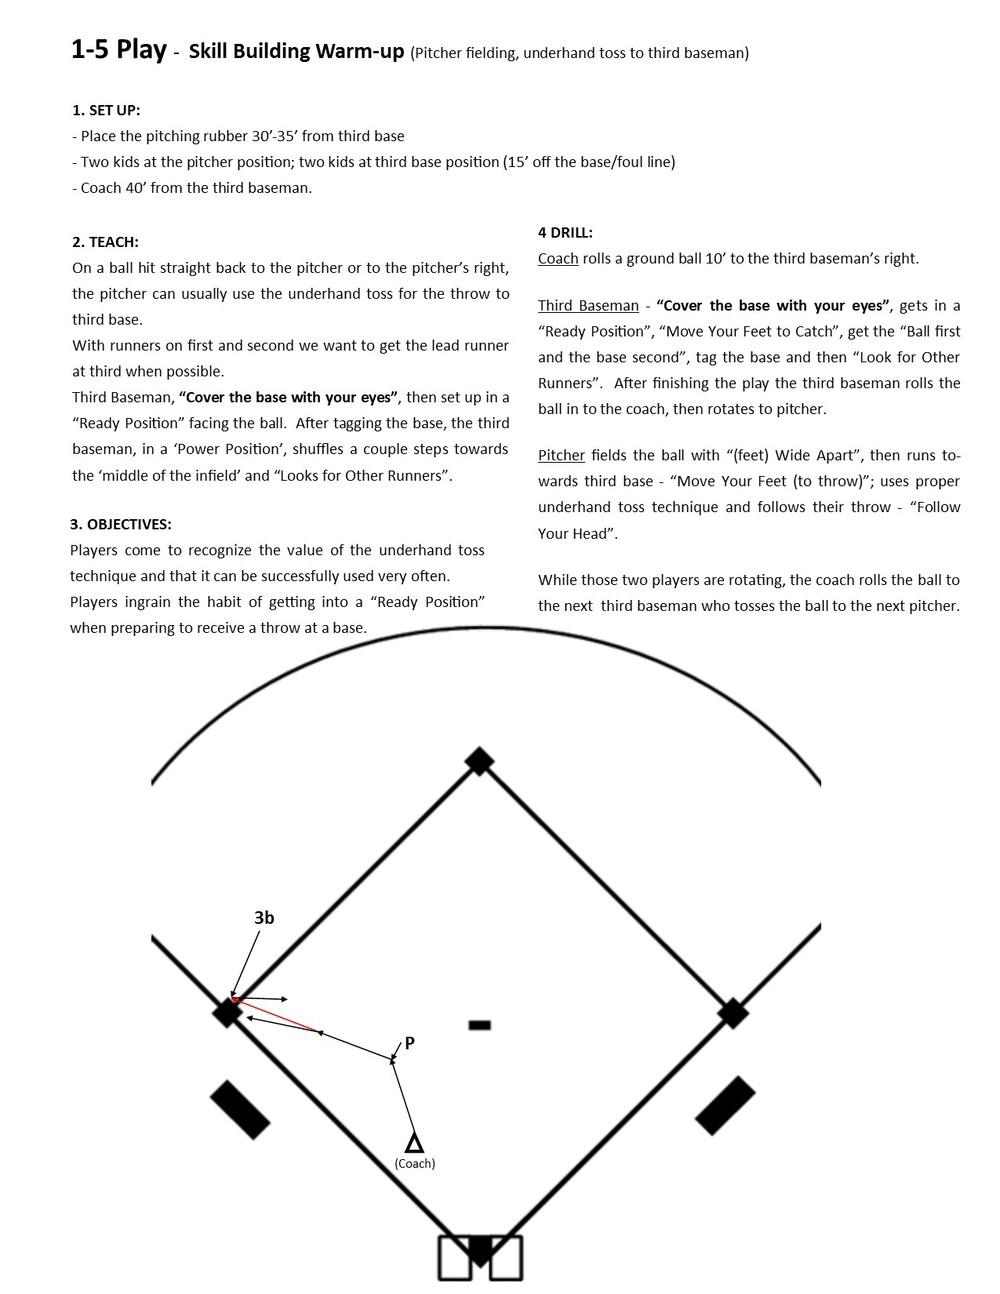 1-5 Play - SBW version.jpg